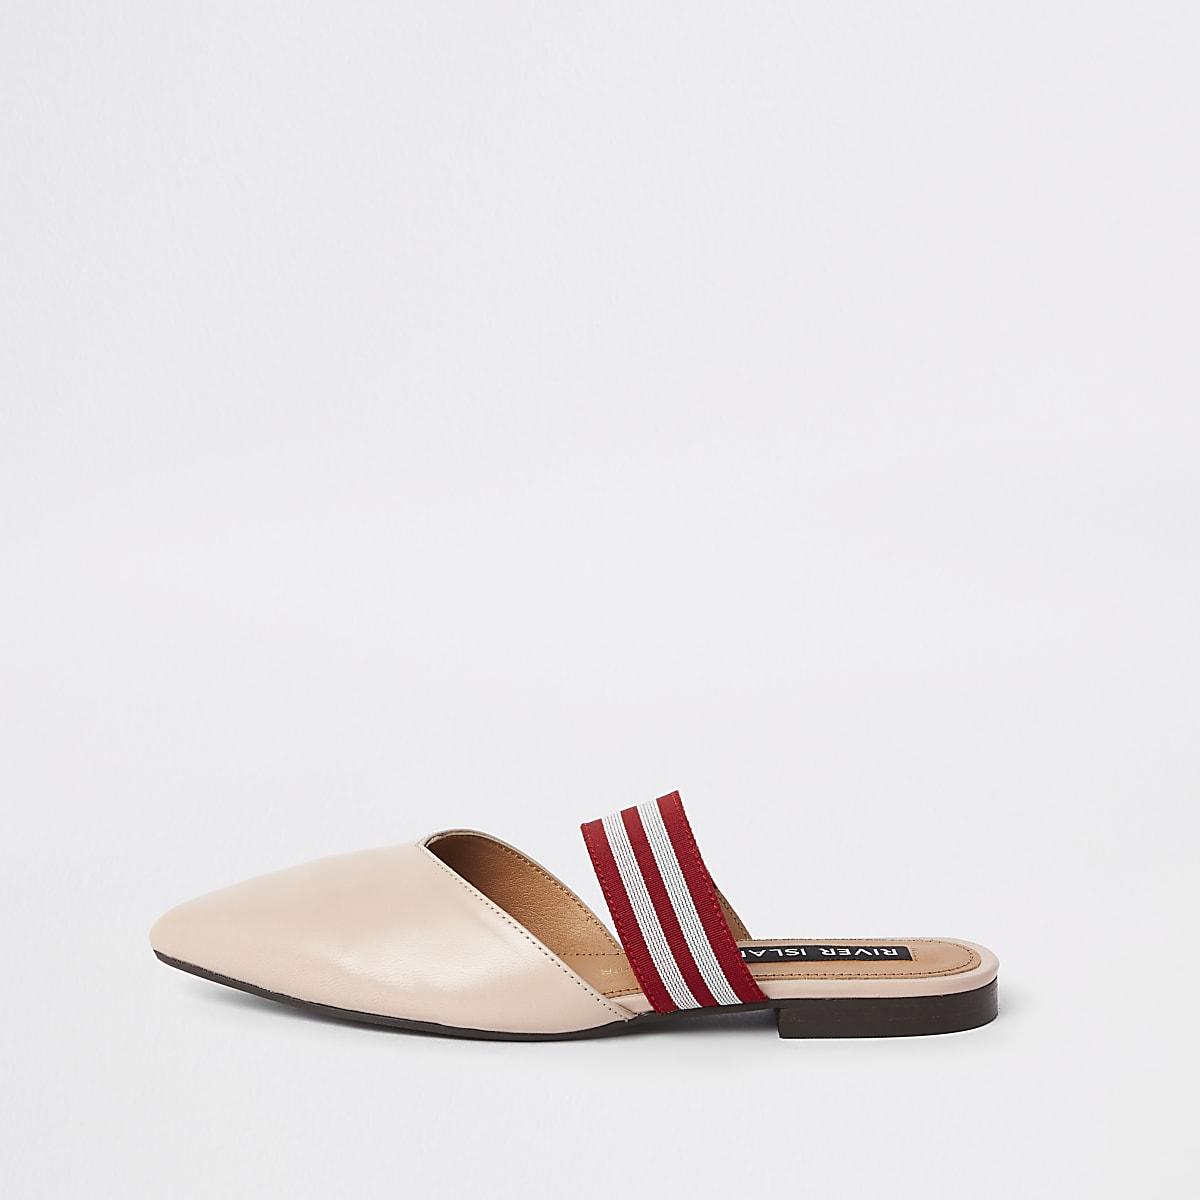 Light pink leather backless loafer